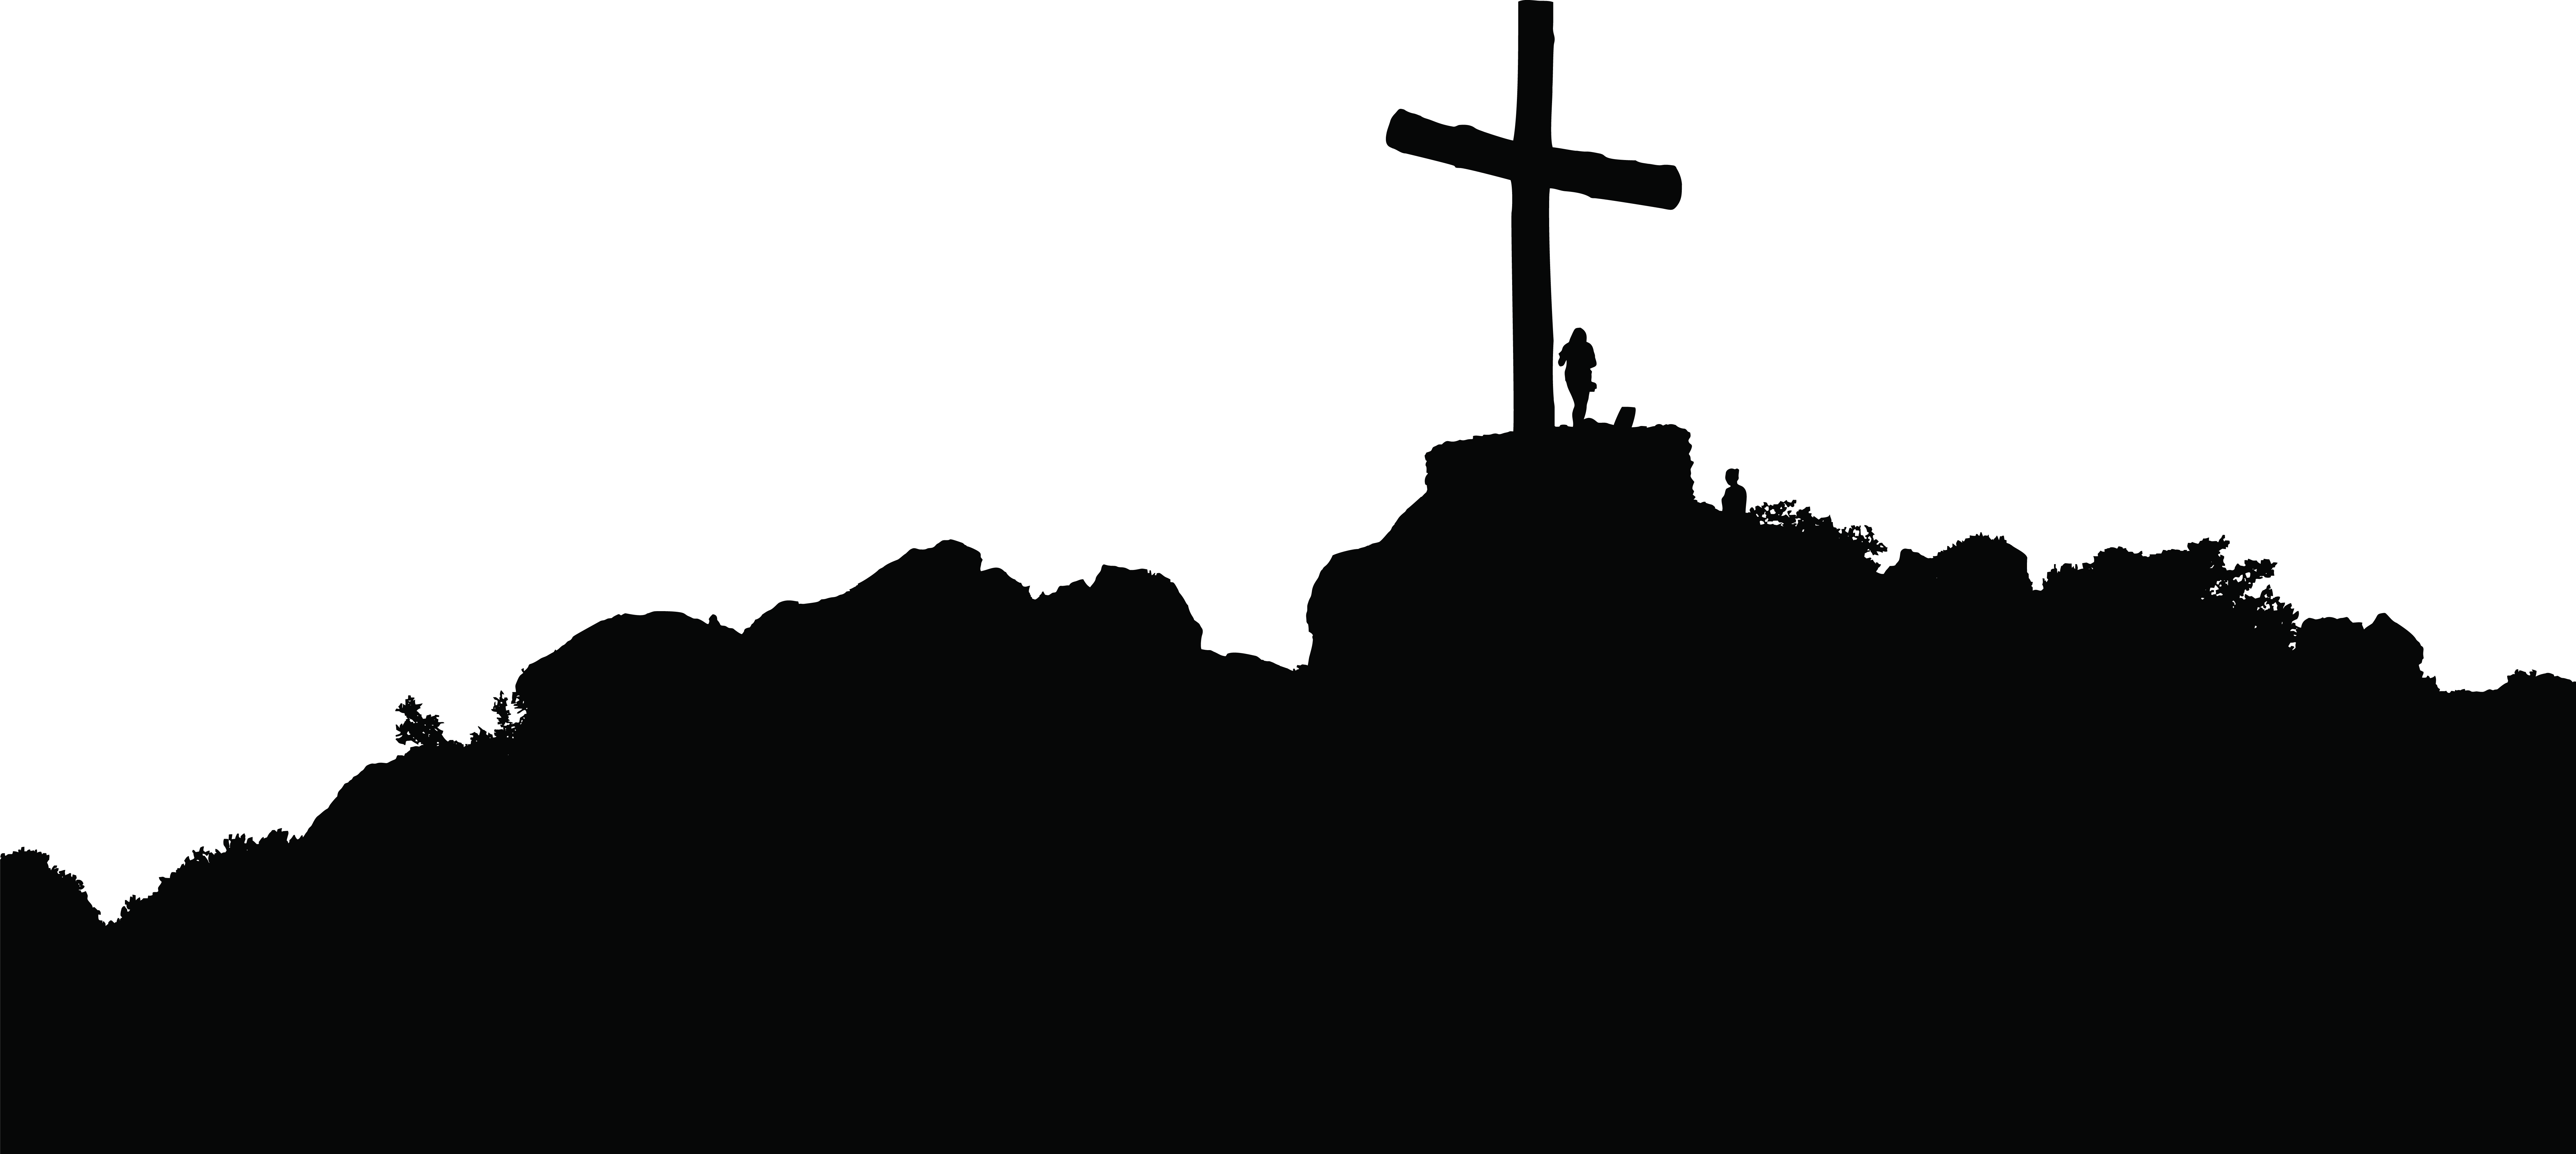 Silhouette Christian cross Clip art.